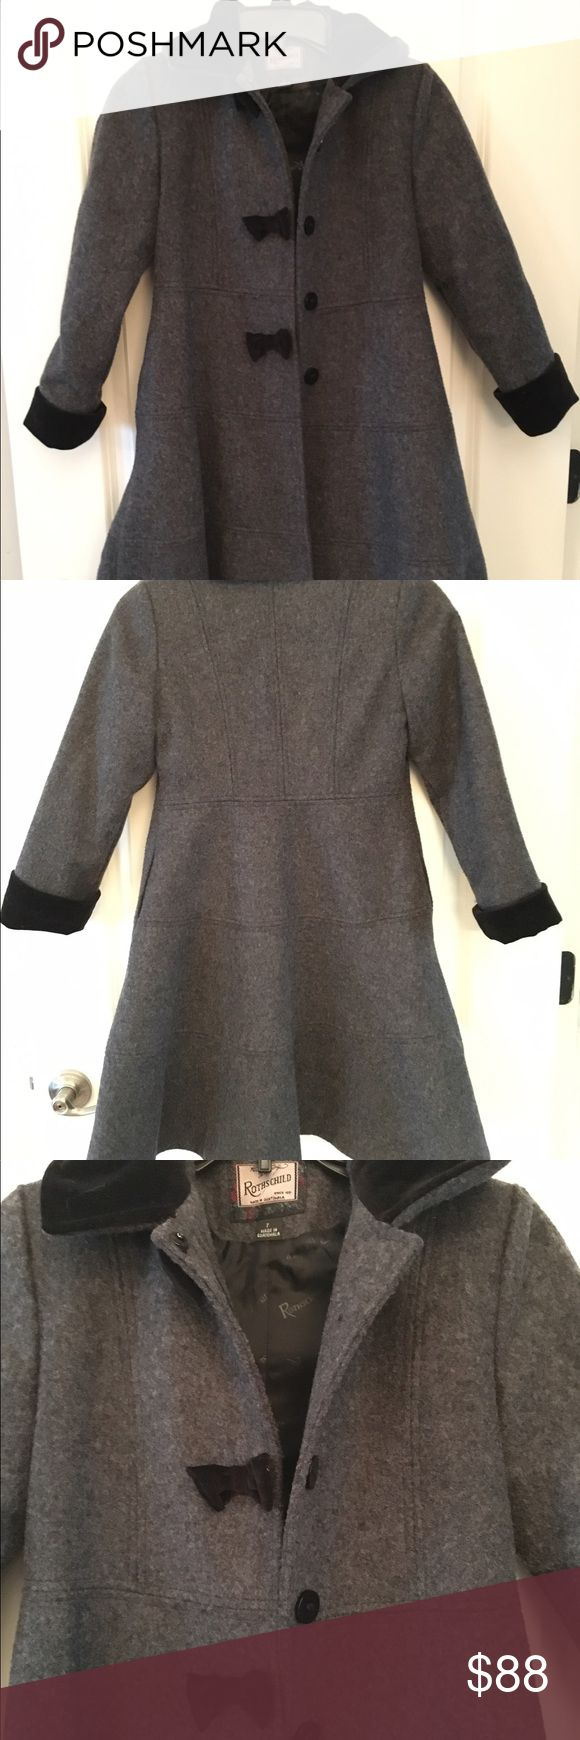 Wool Pea Coat 100% Wool Pea Coat. Uber Fashionable for the winter months! Rothschild Jackets & Coats Pea Coats